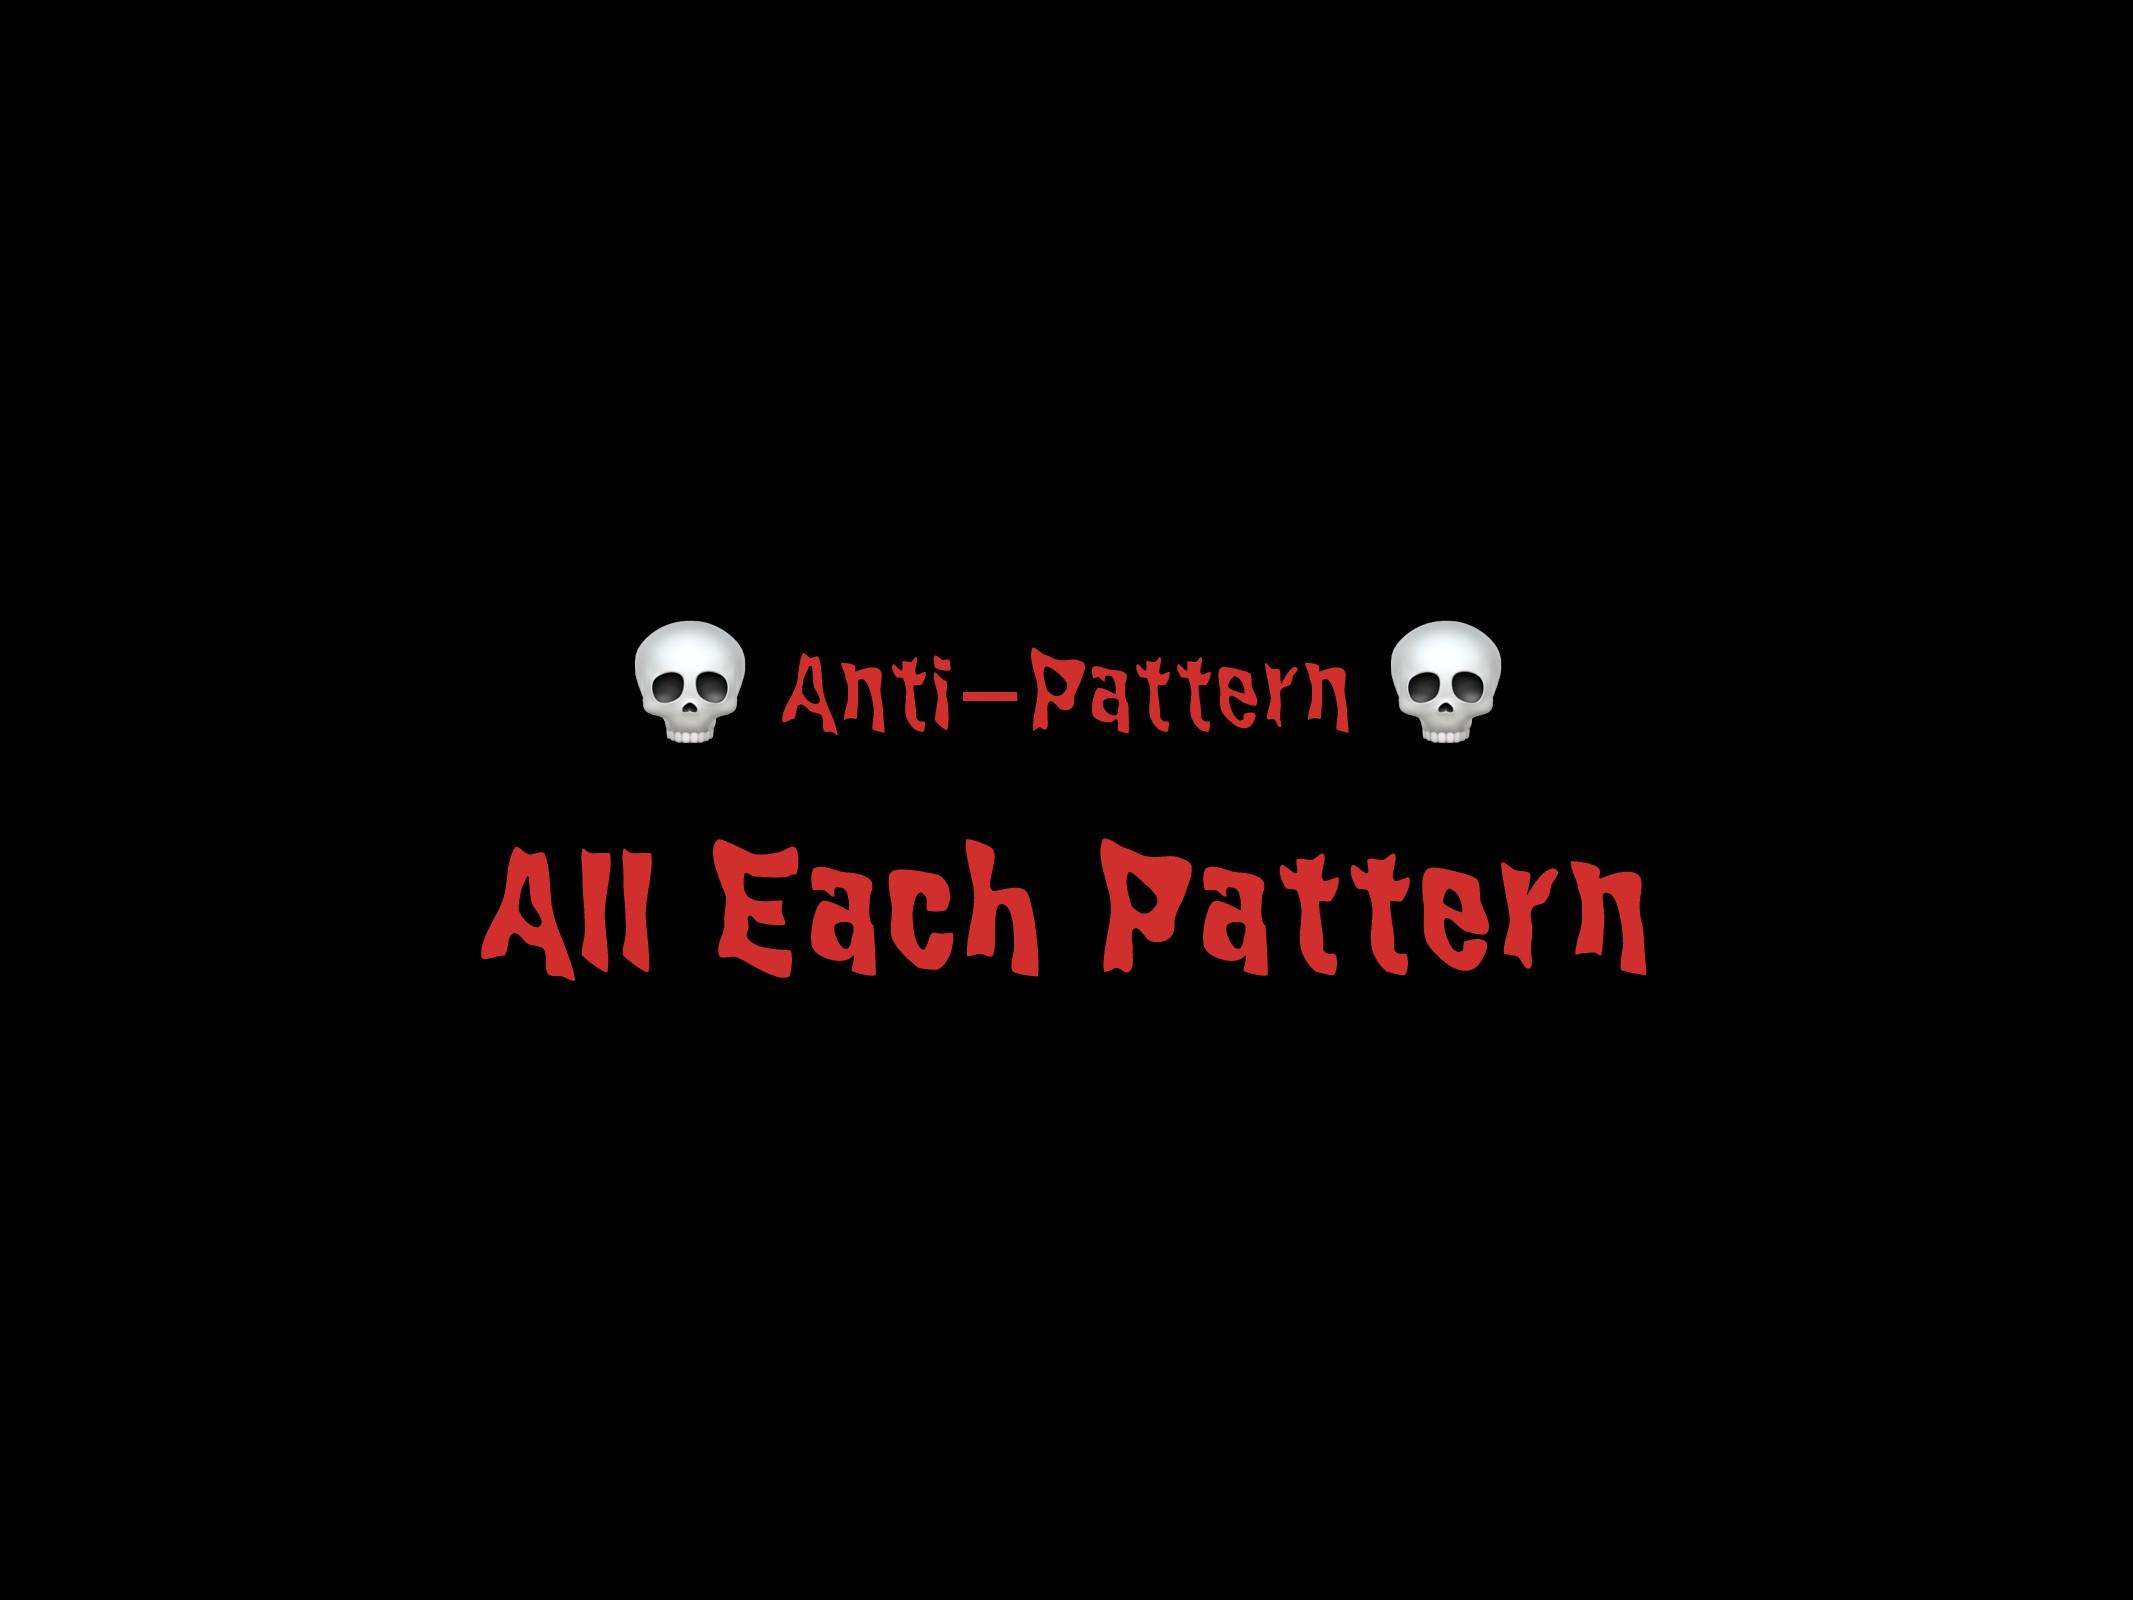 All Each Pattern 13  Anti-Pattern